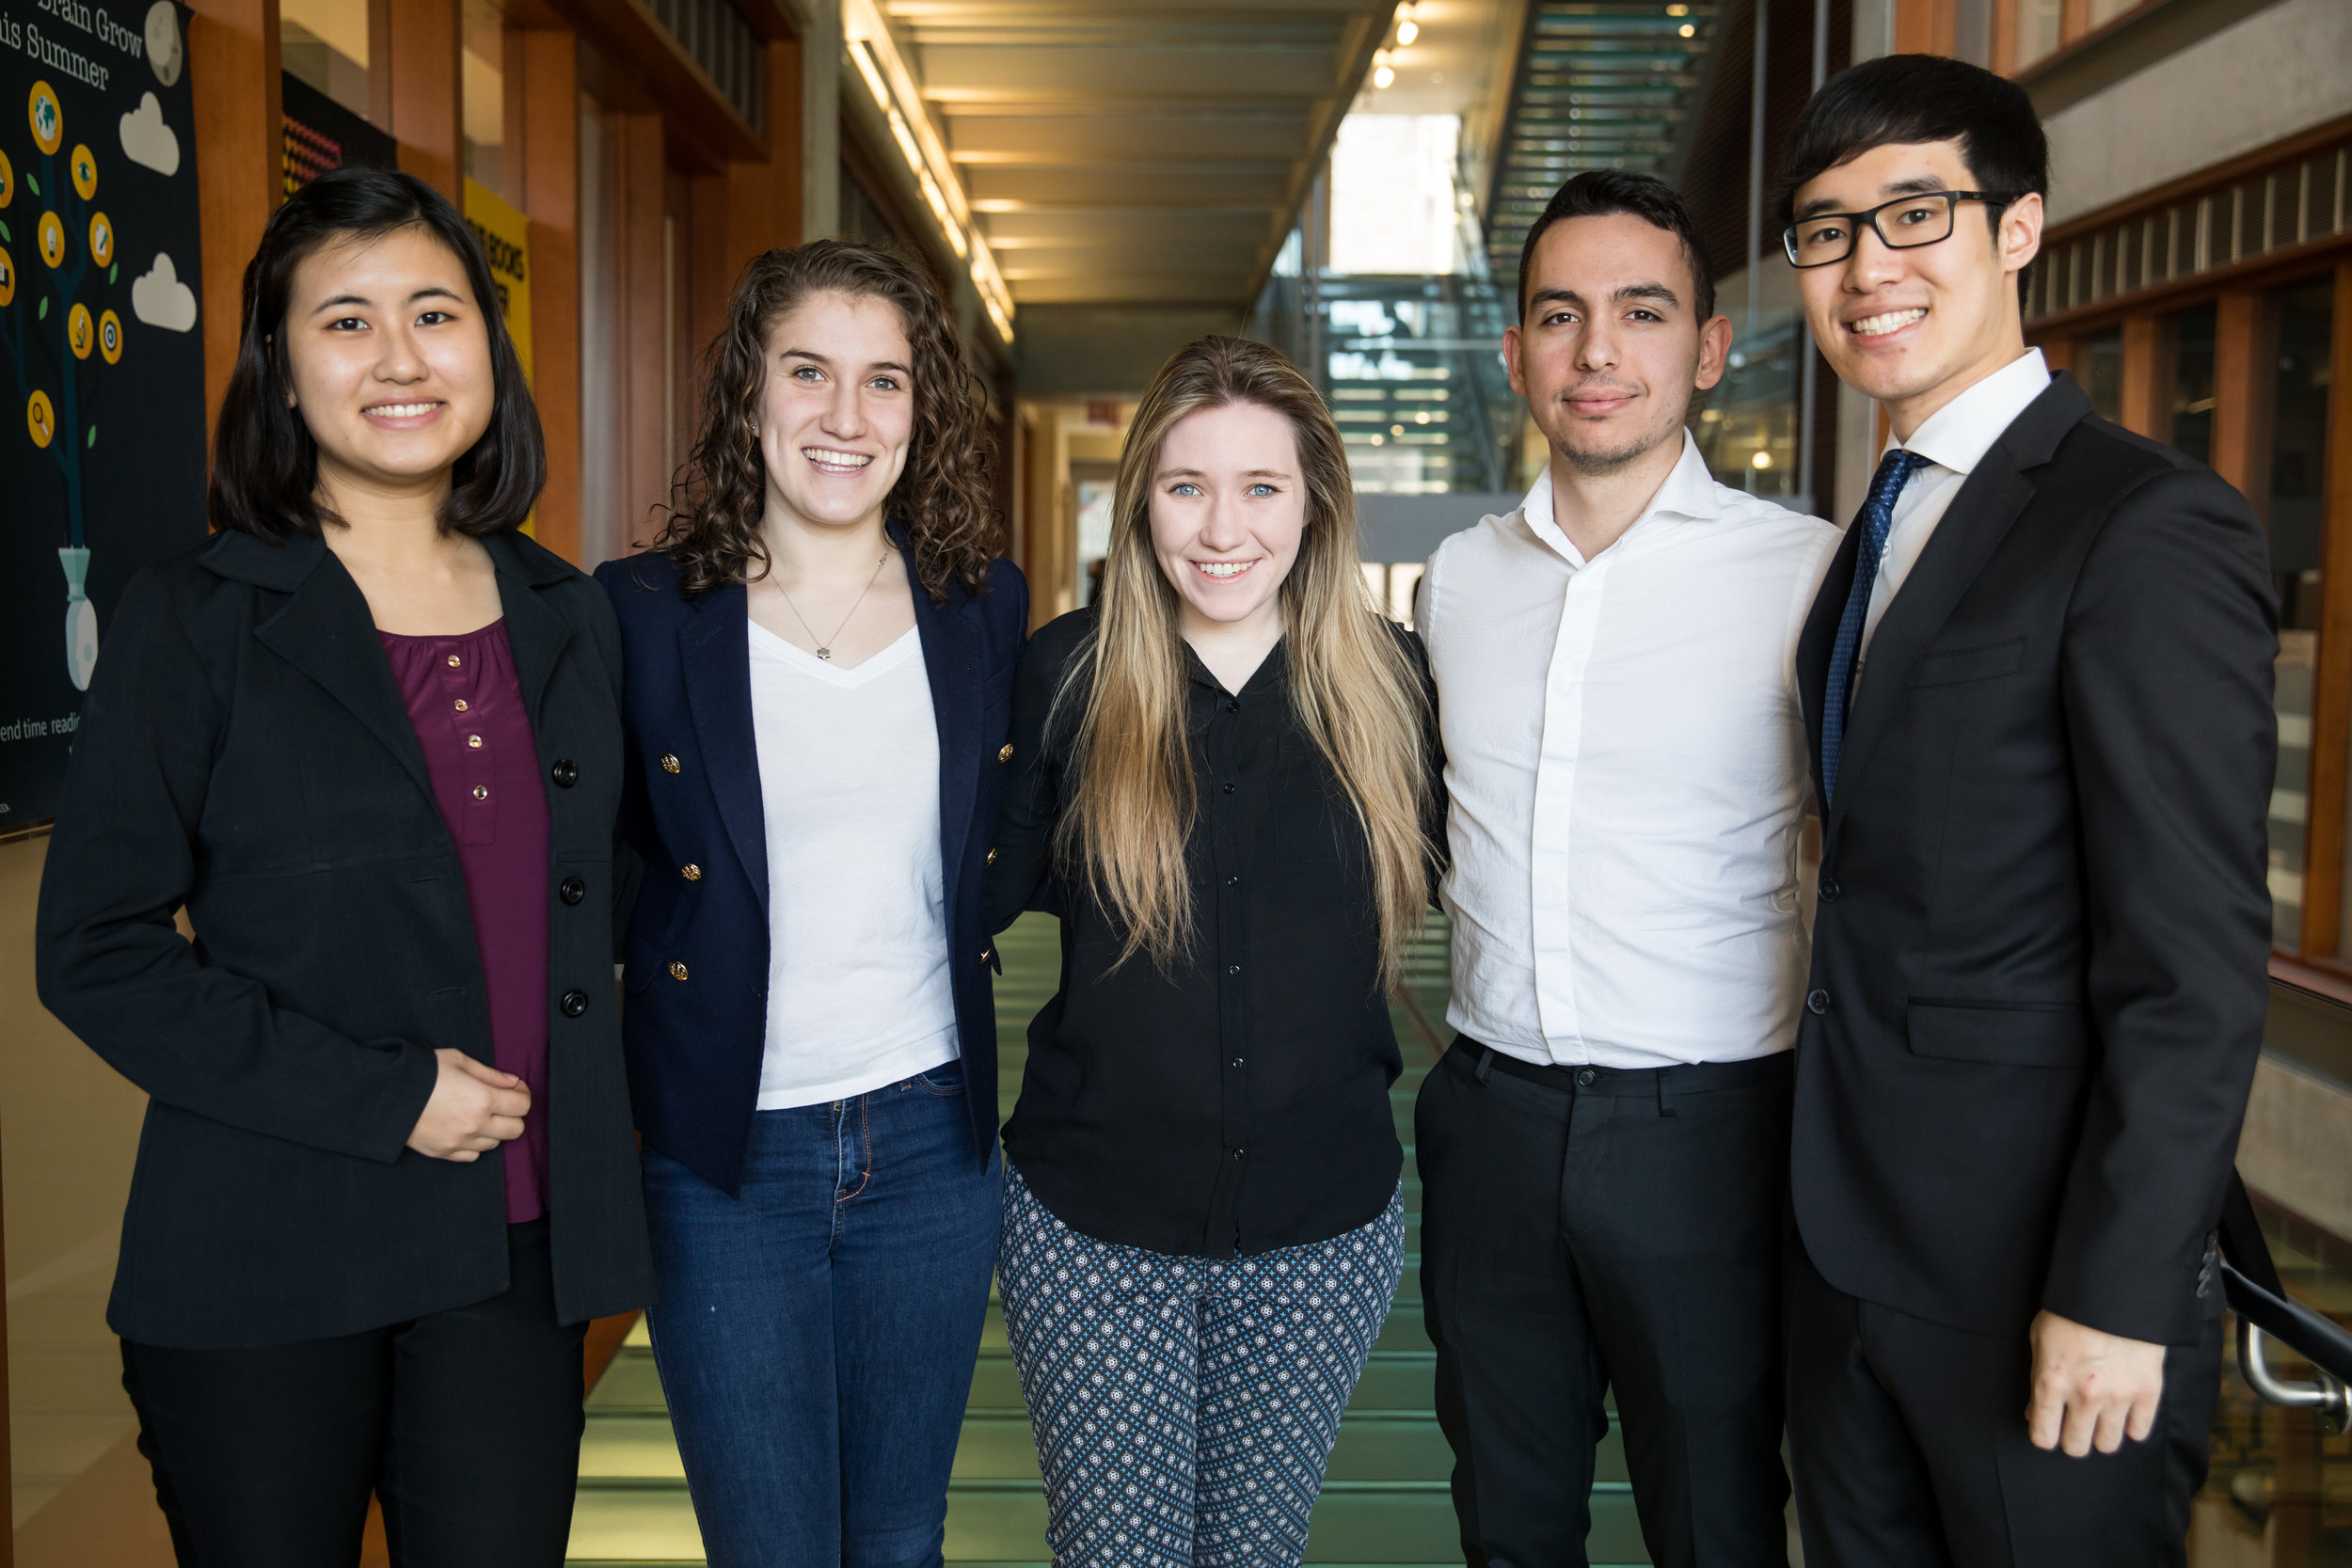 Team Personalize  Left to right: Jasmine Kim, Beth Lester, Anna O'Donnell, Mert Pekdemir, Joshua Kim